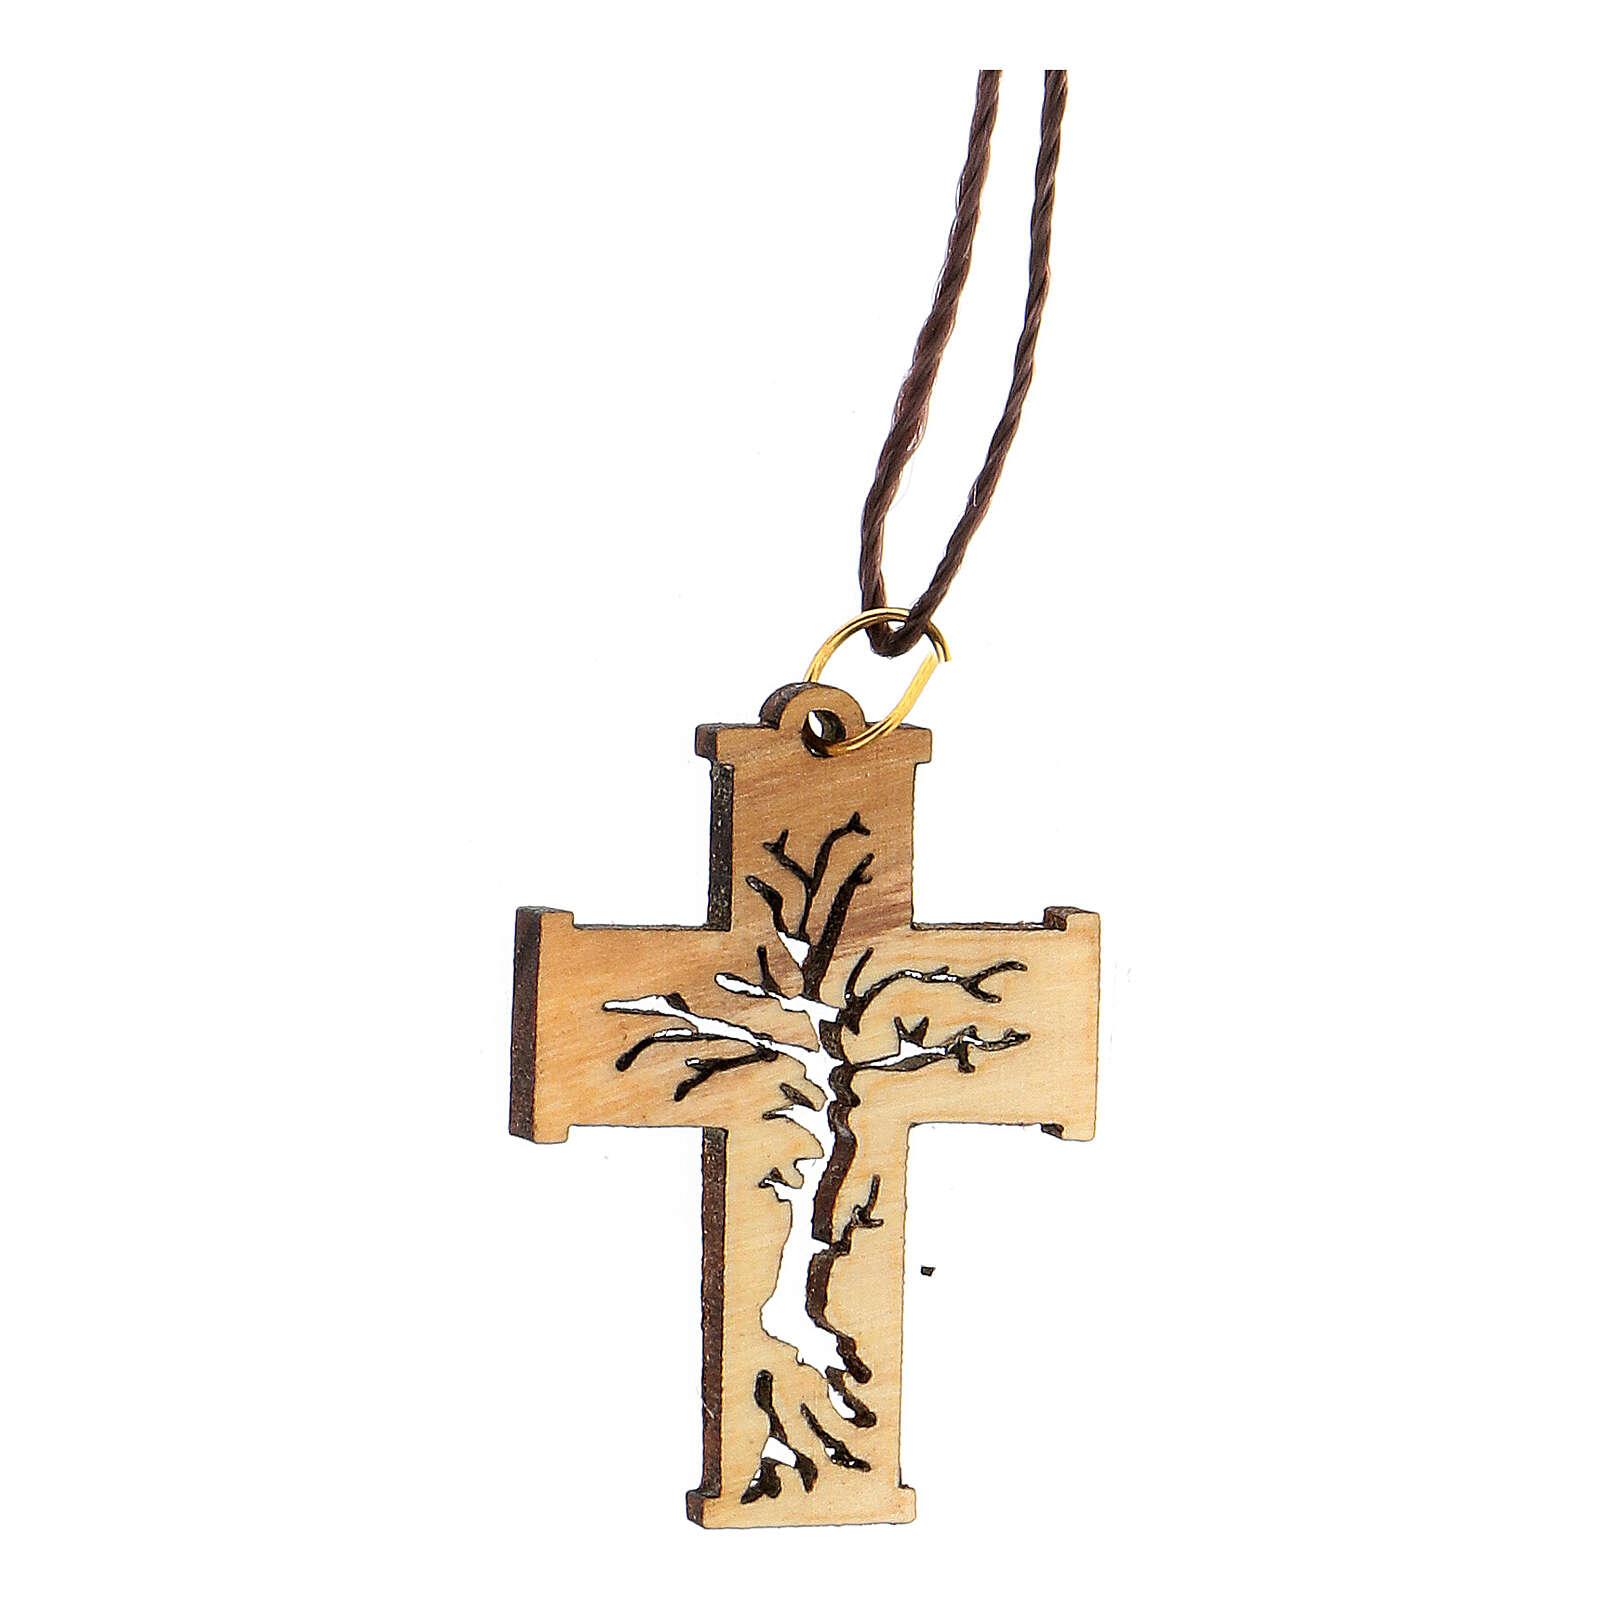 Collar colgante perforado Árbol Vida madera olivo Belén 4